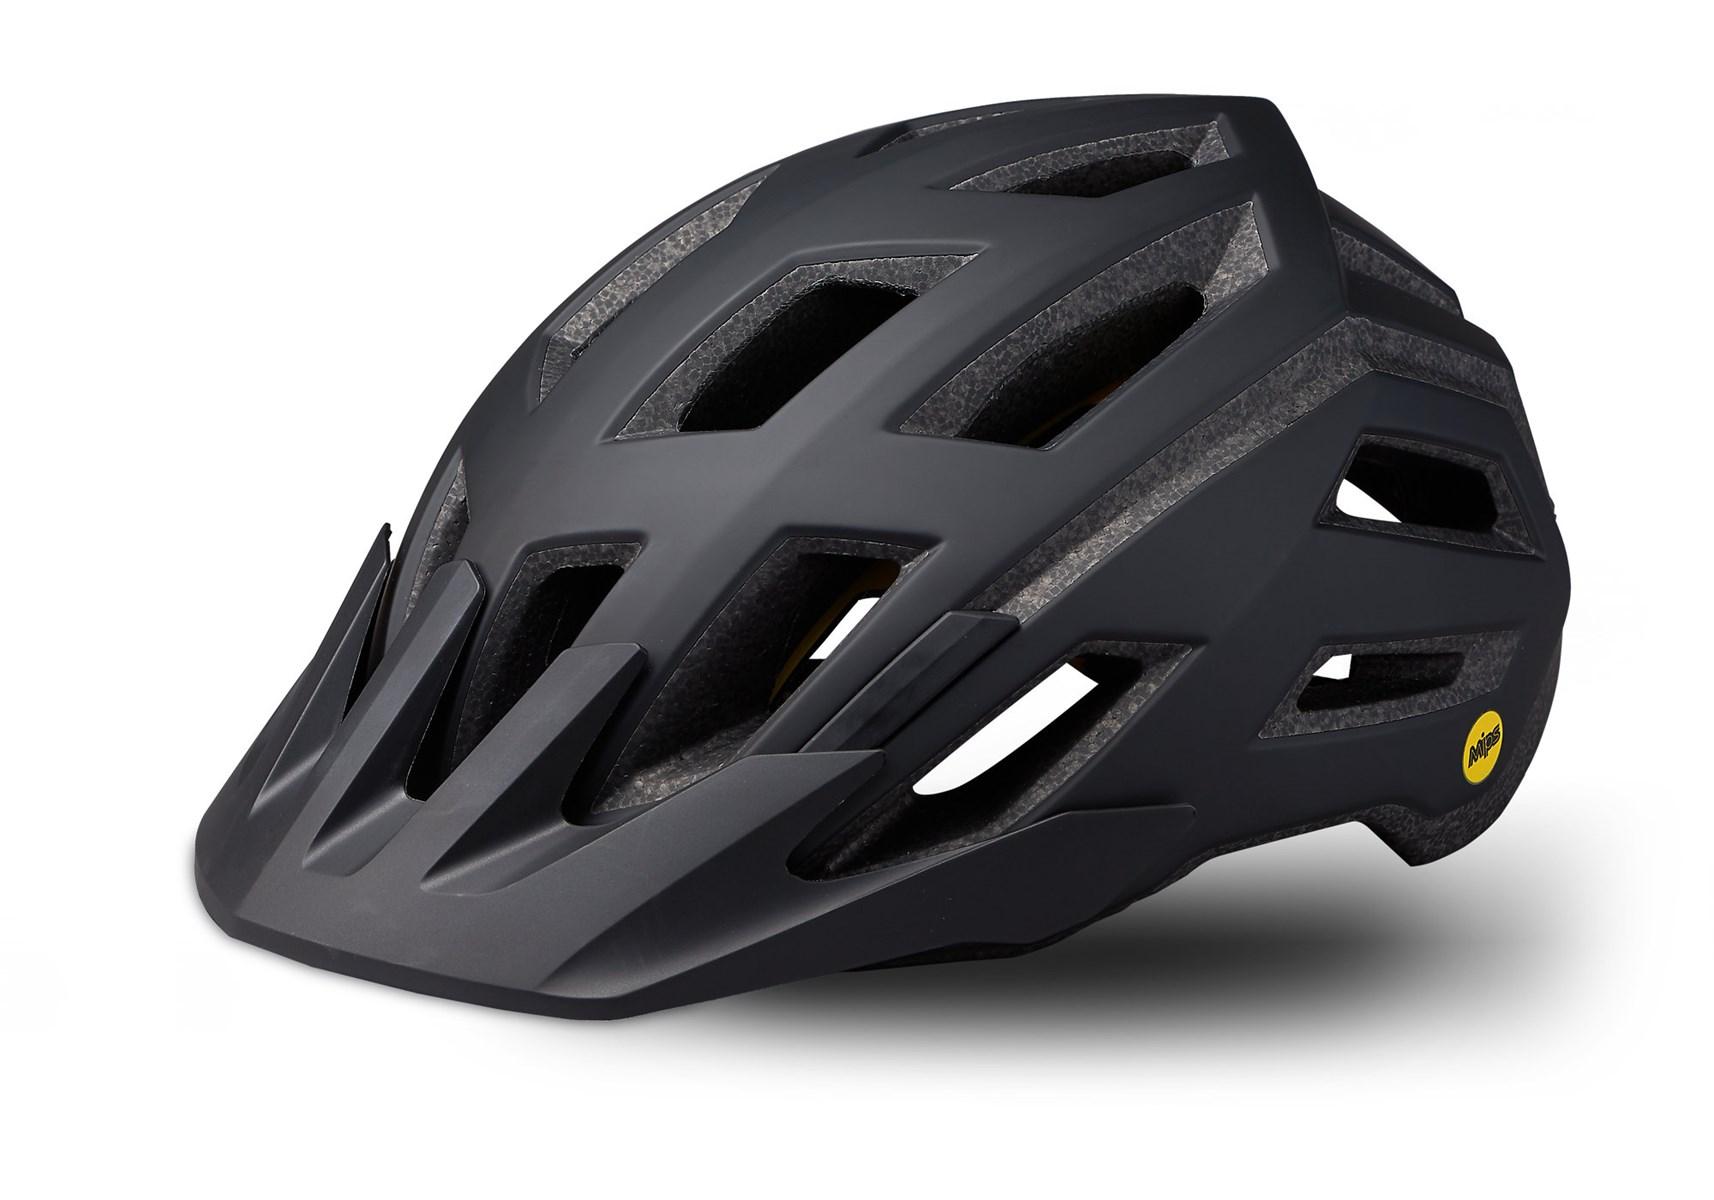 306dd0e4686 Specialized Tactic 3 MIPS Helmet - Black £80.00